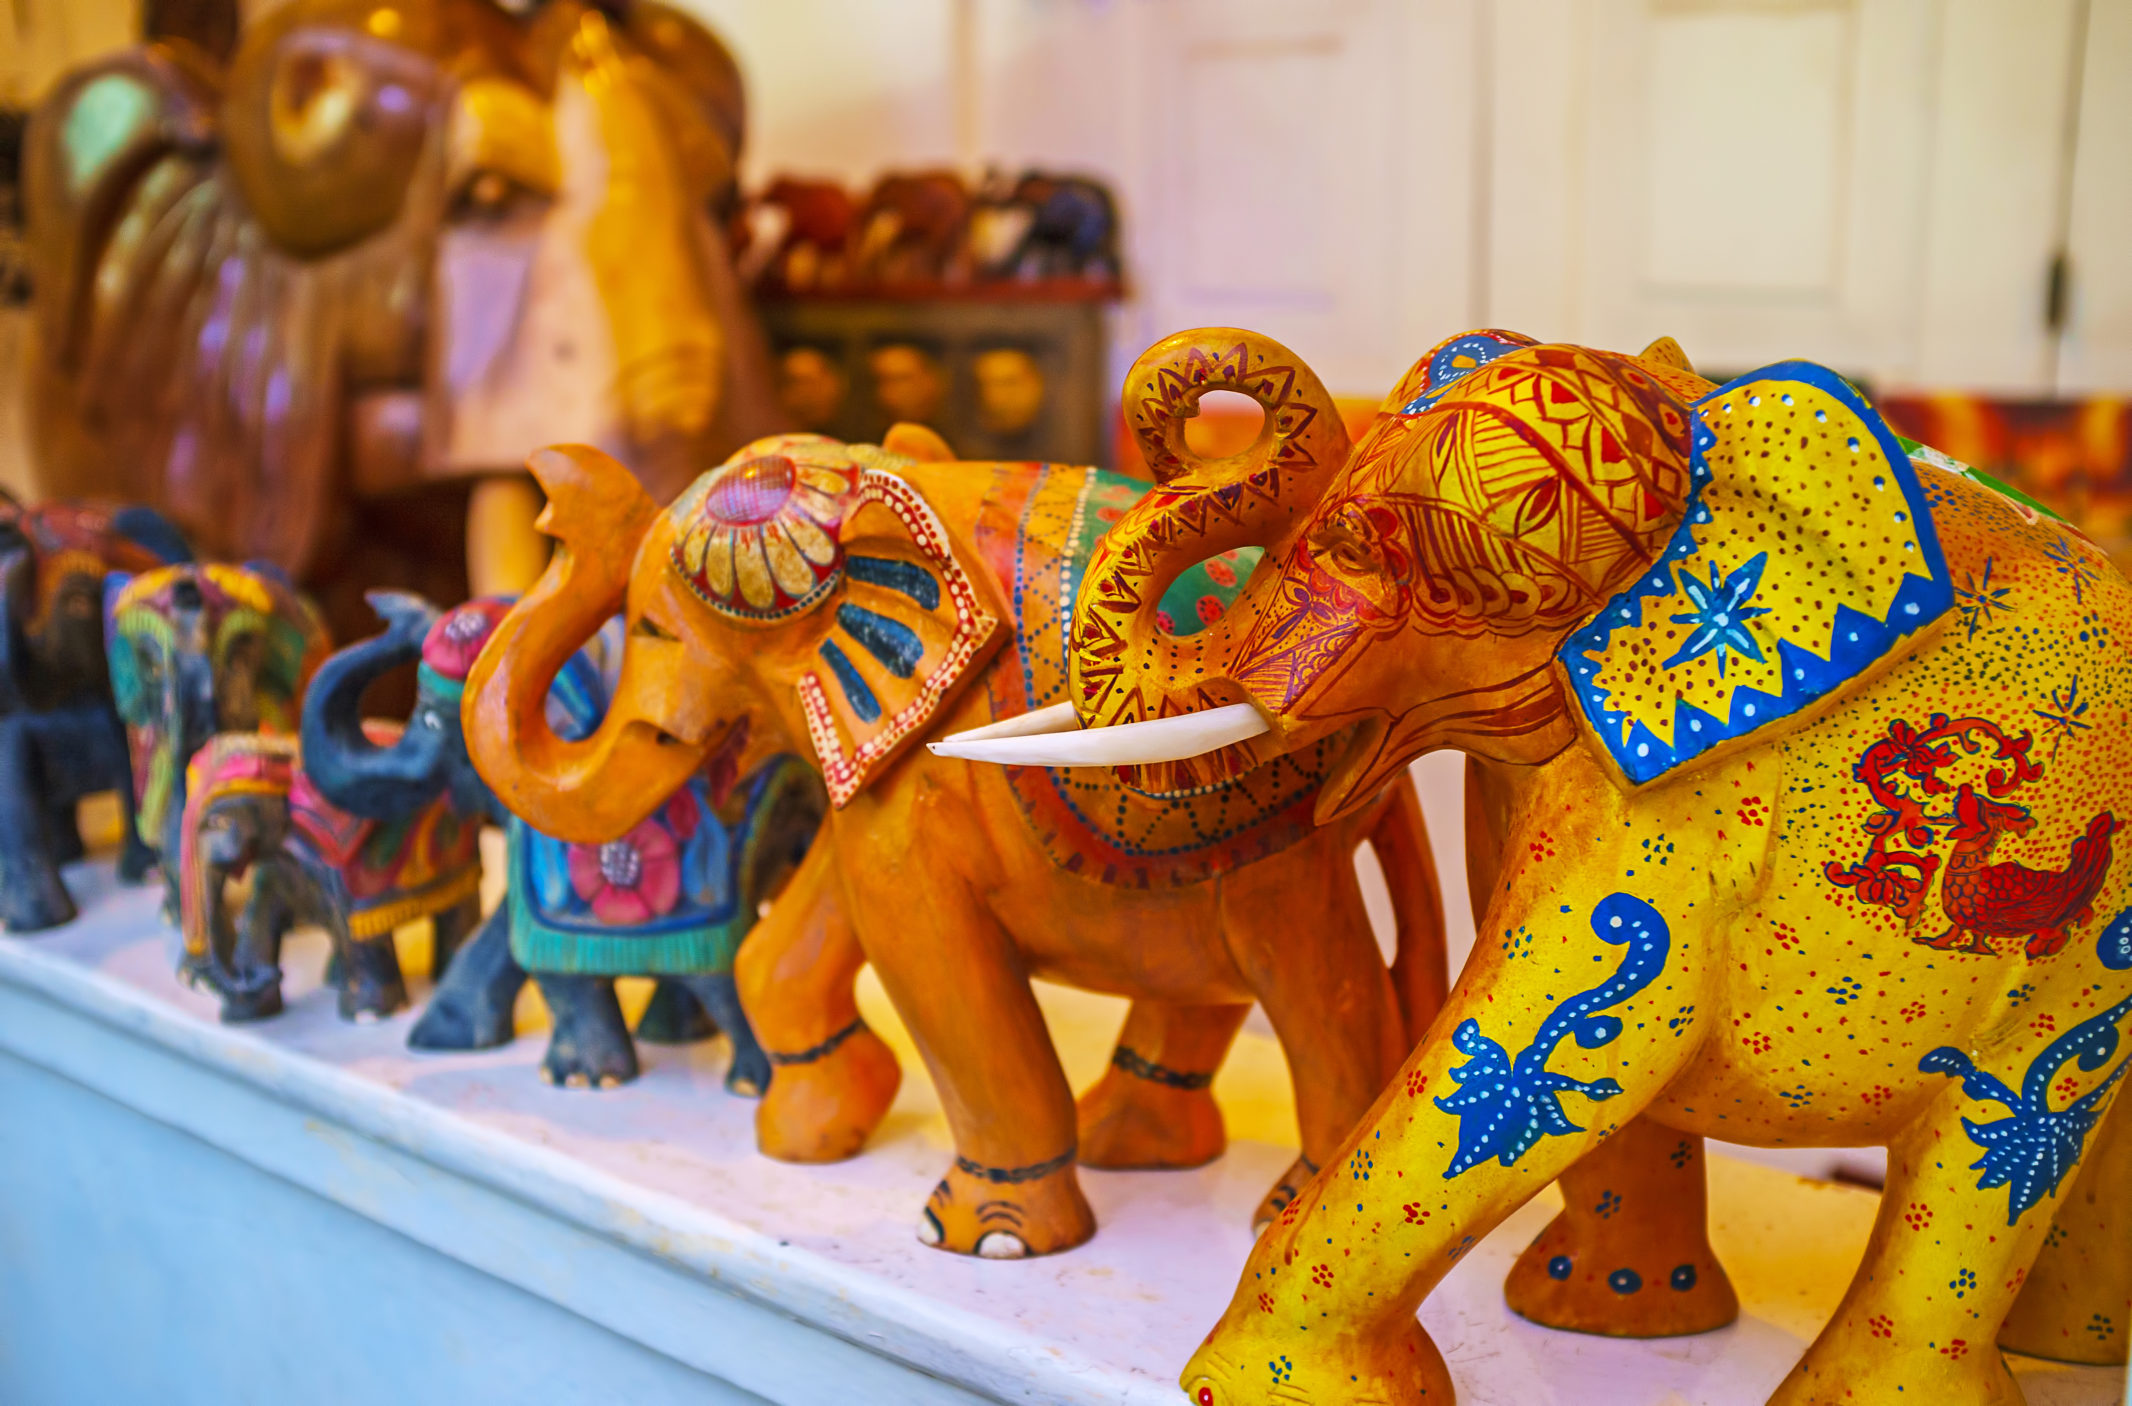 Sri Lanka [Shutterstock]